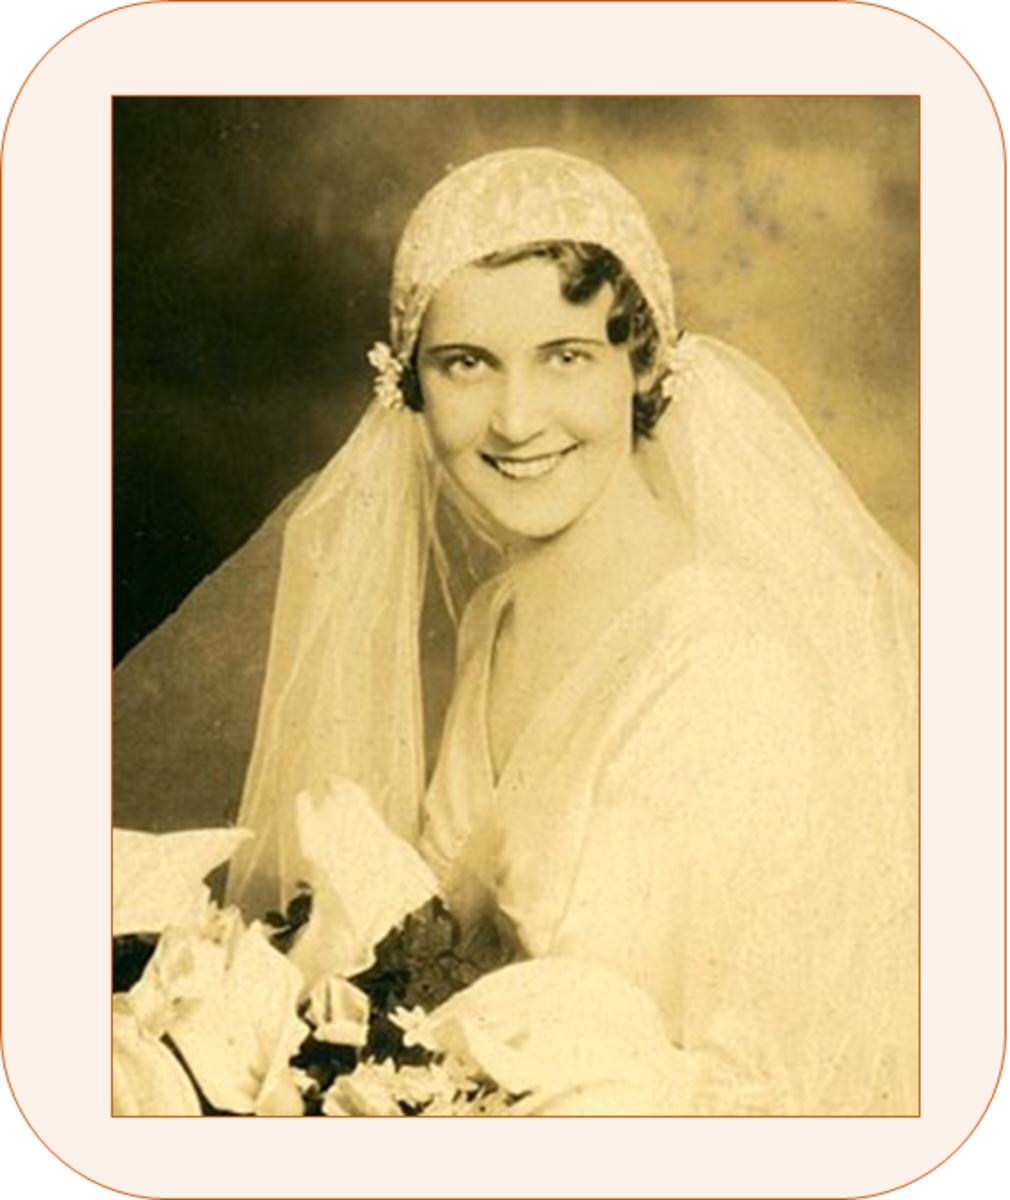 Antique bridal headpiece - Cloche cap wedding veil of the 1920s